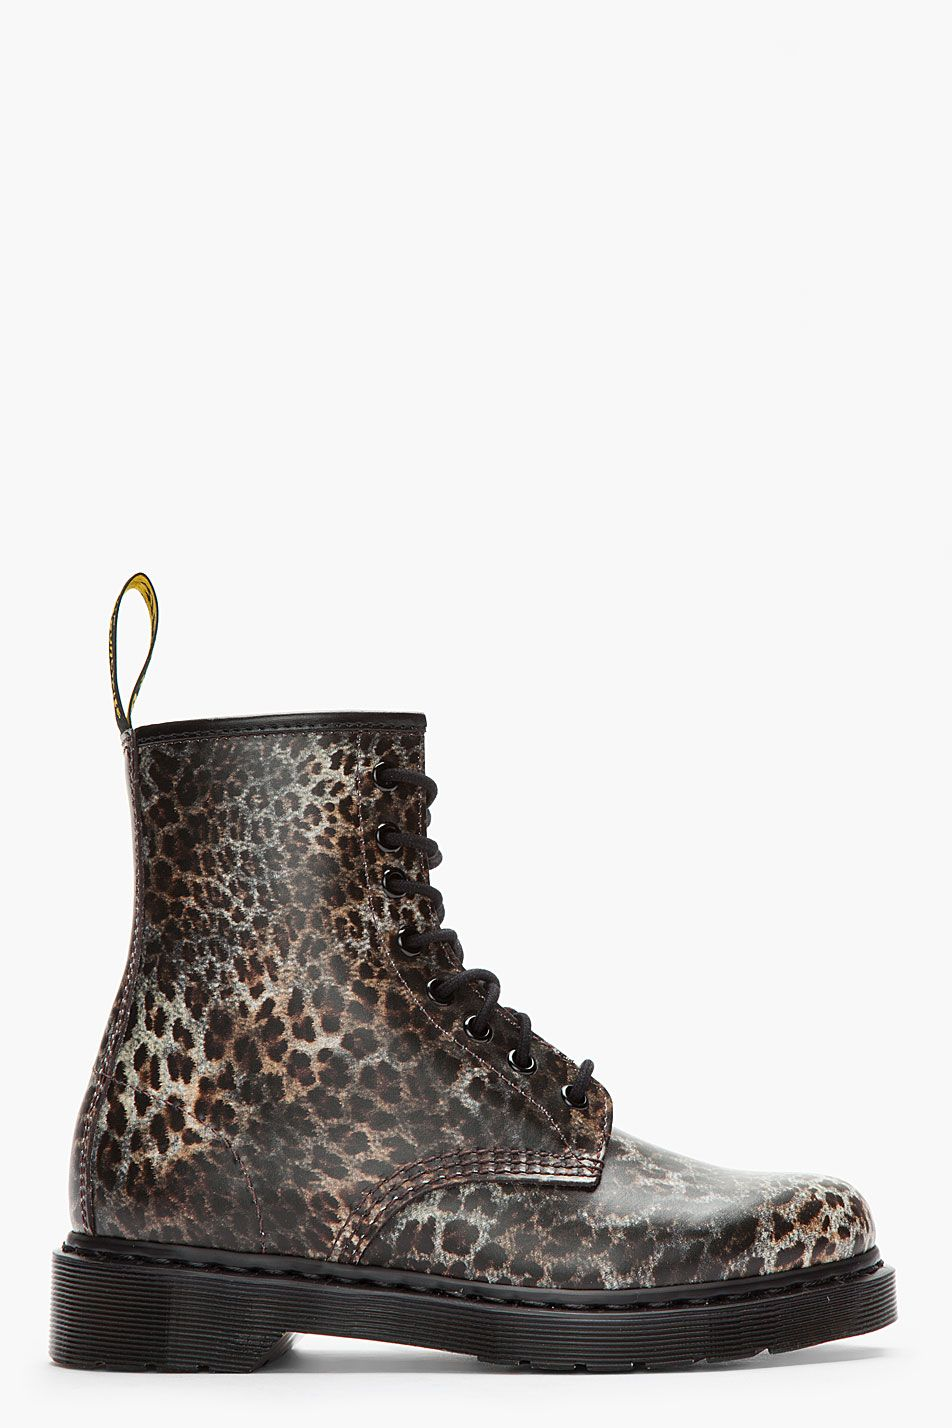 dr martens leopard print boots